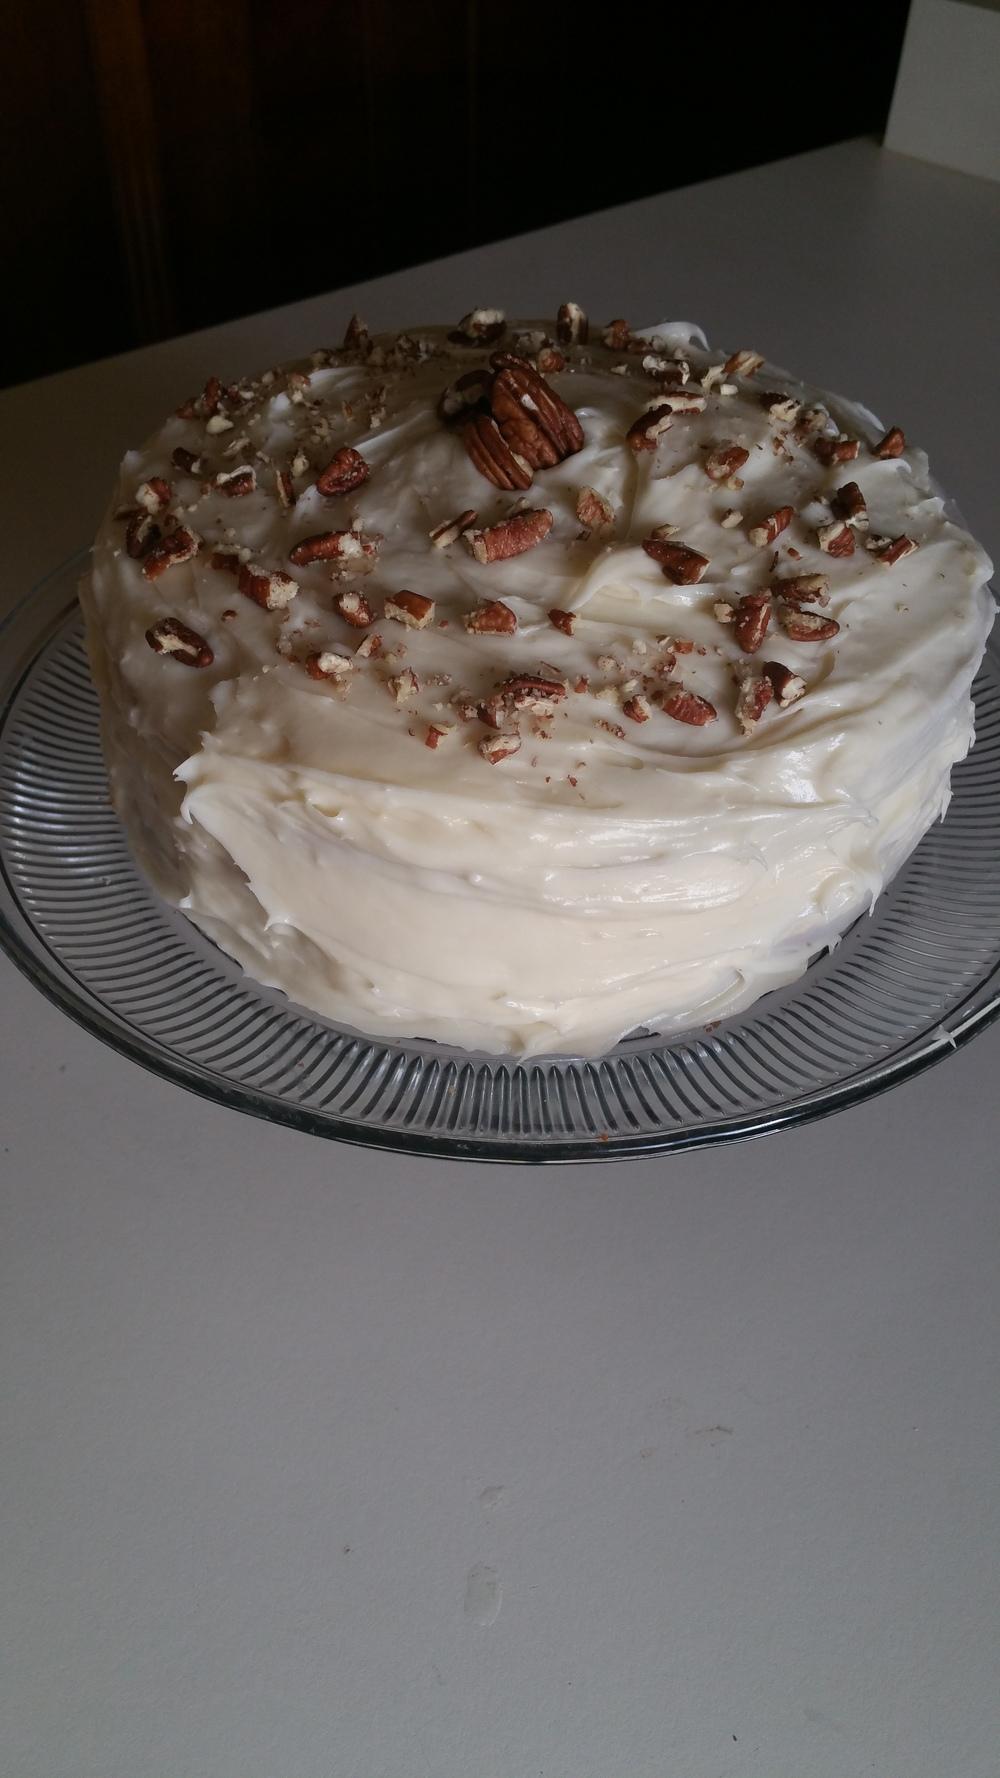 Butter Pecan Cake - The Peachy Pixel